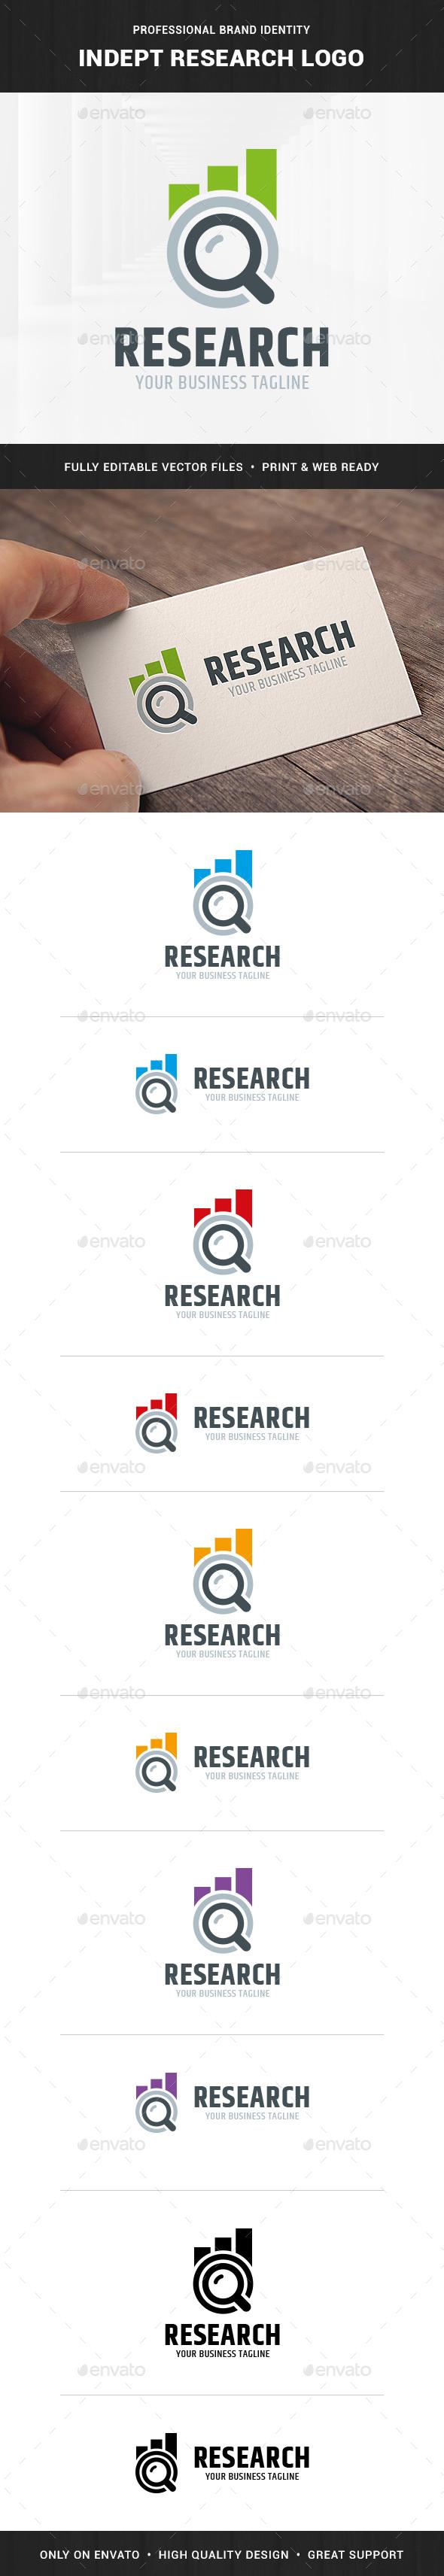 Indept Research Logo Template - Symbols Logo Templates